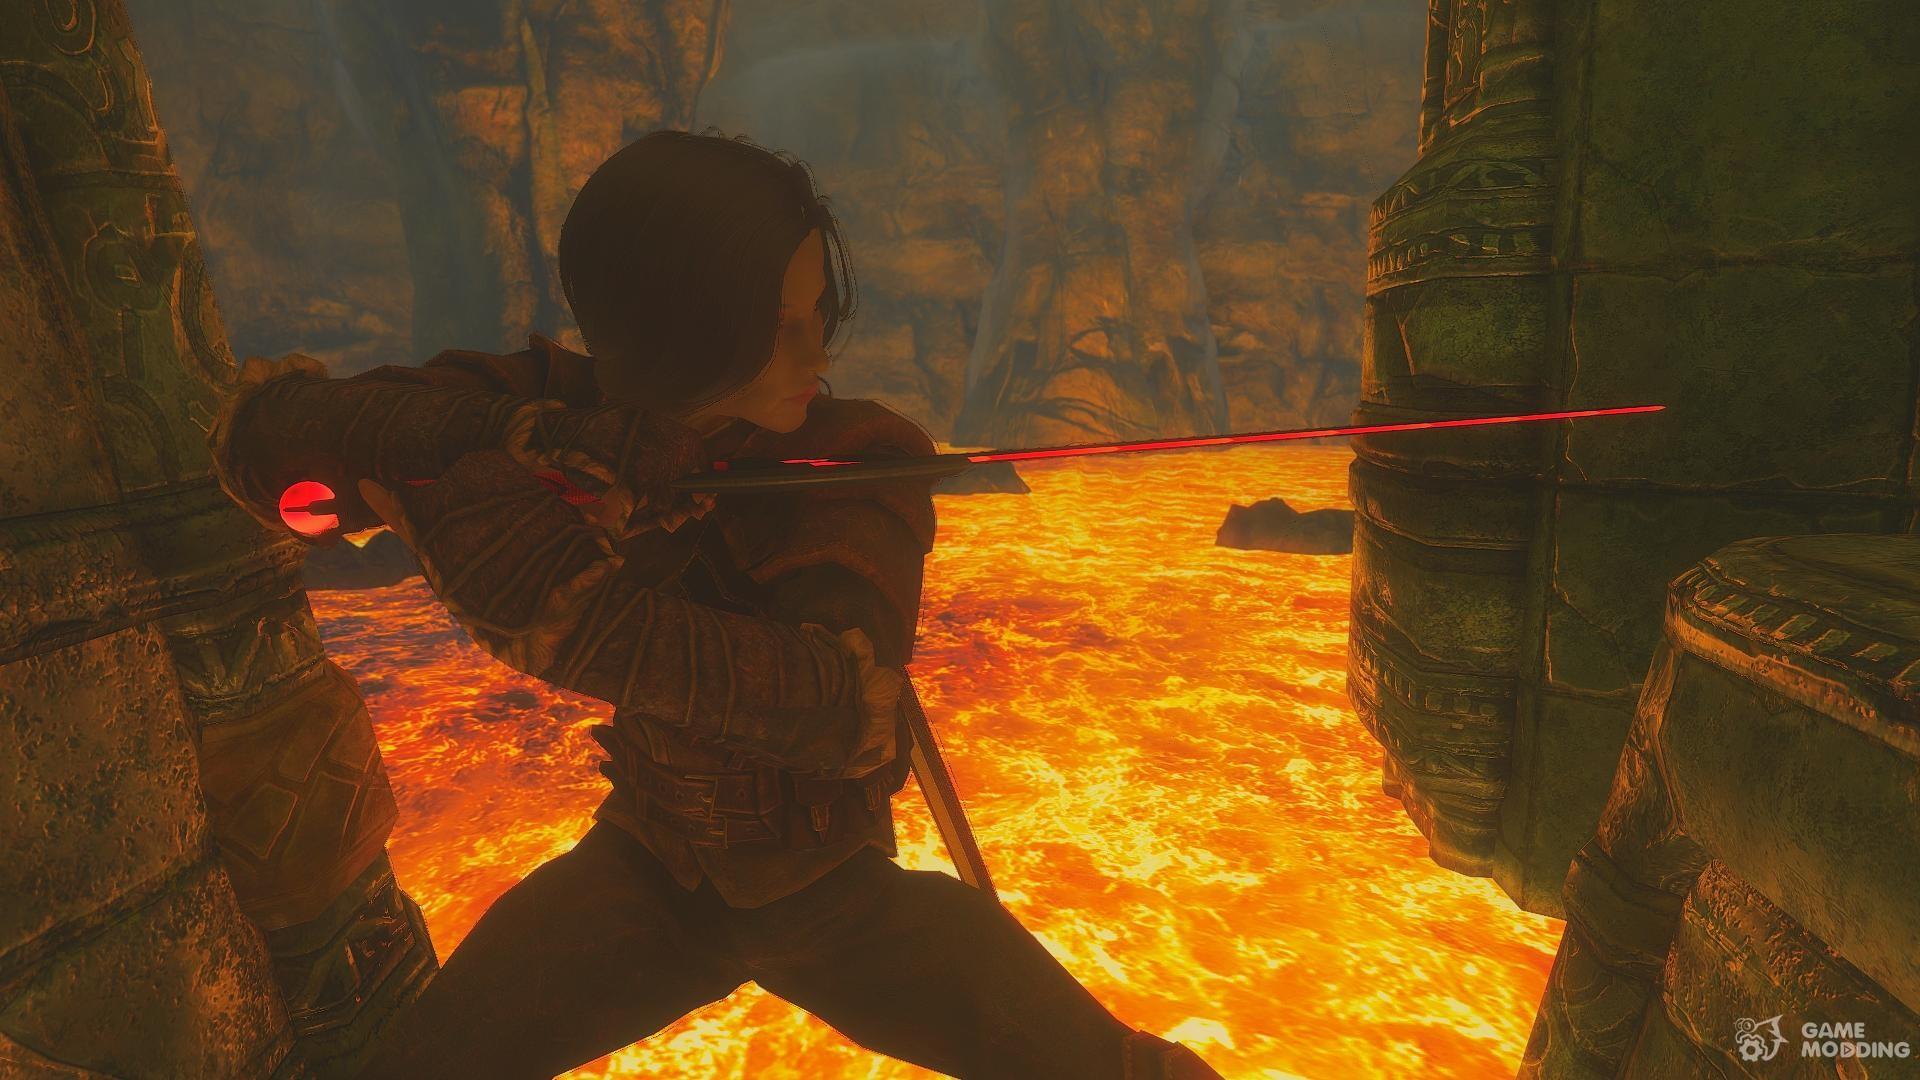 The Infinity Sword - WIP for TES V: Skyrim